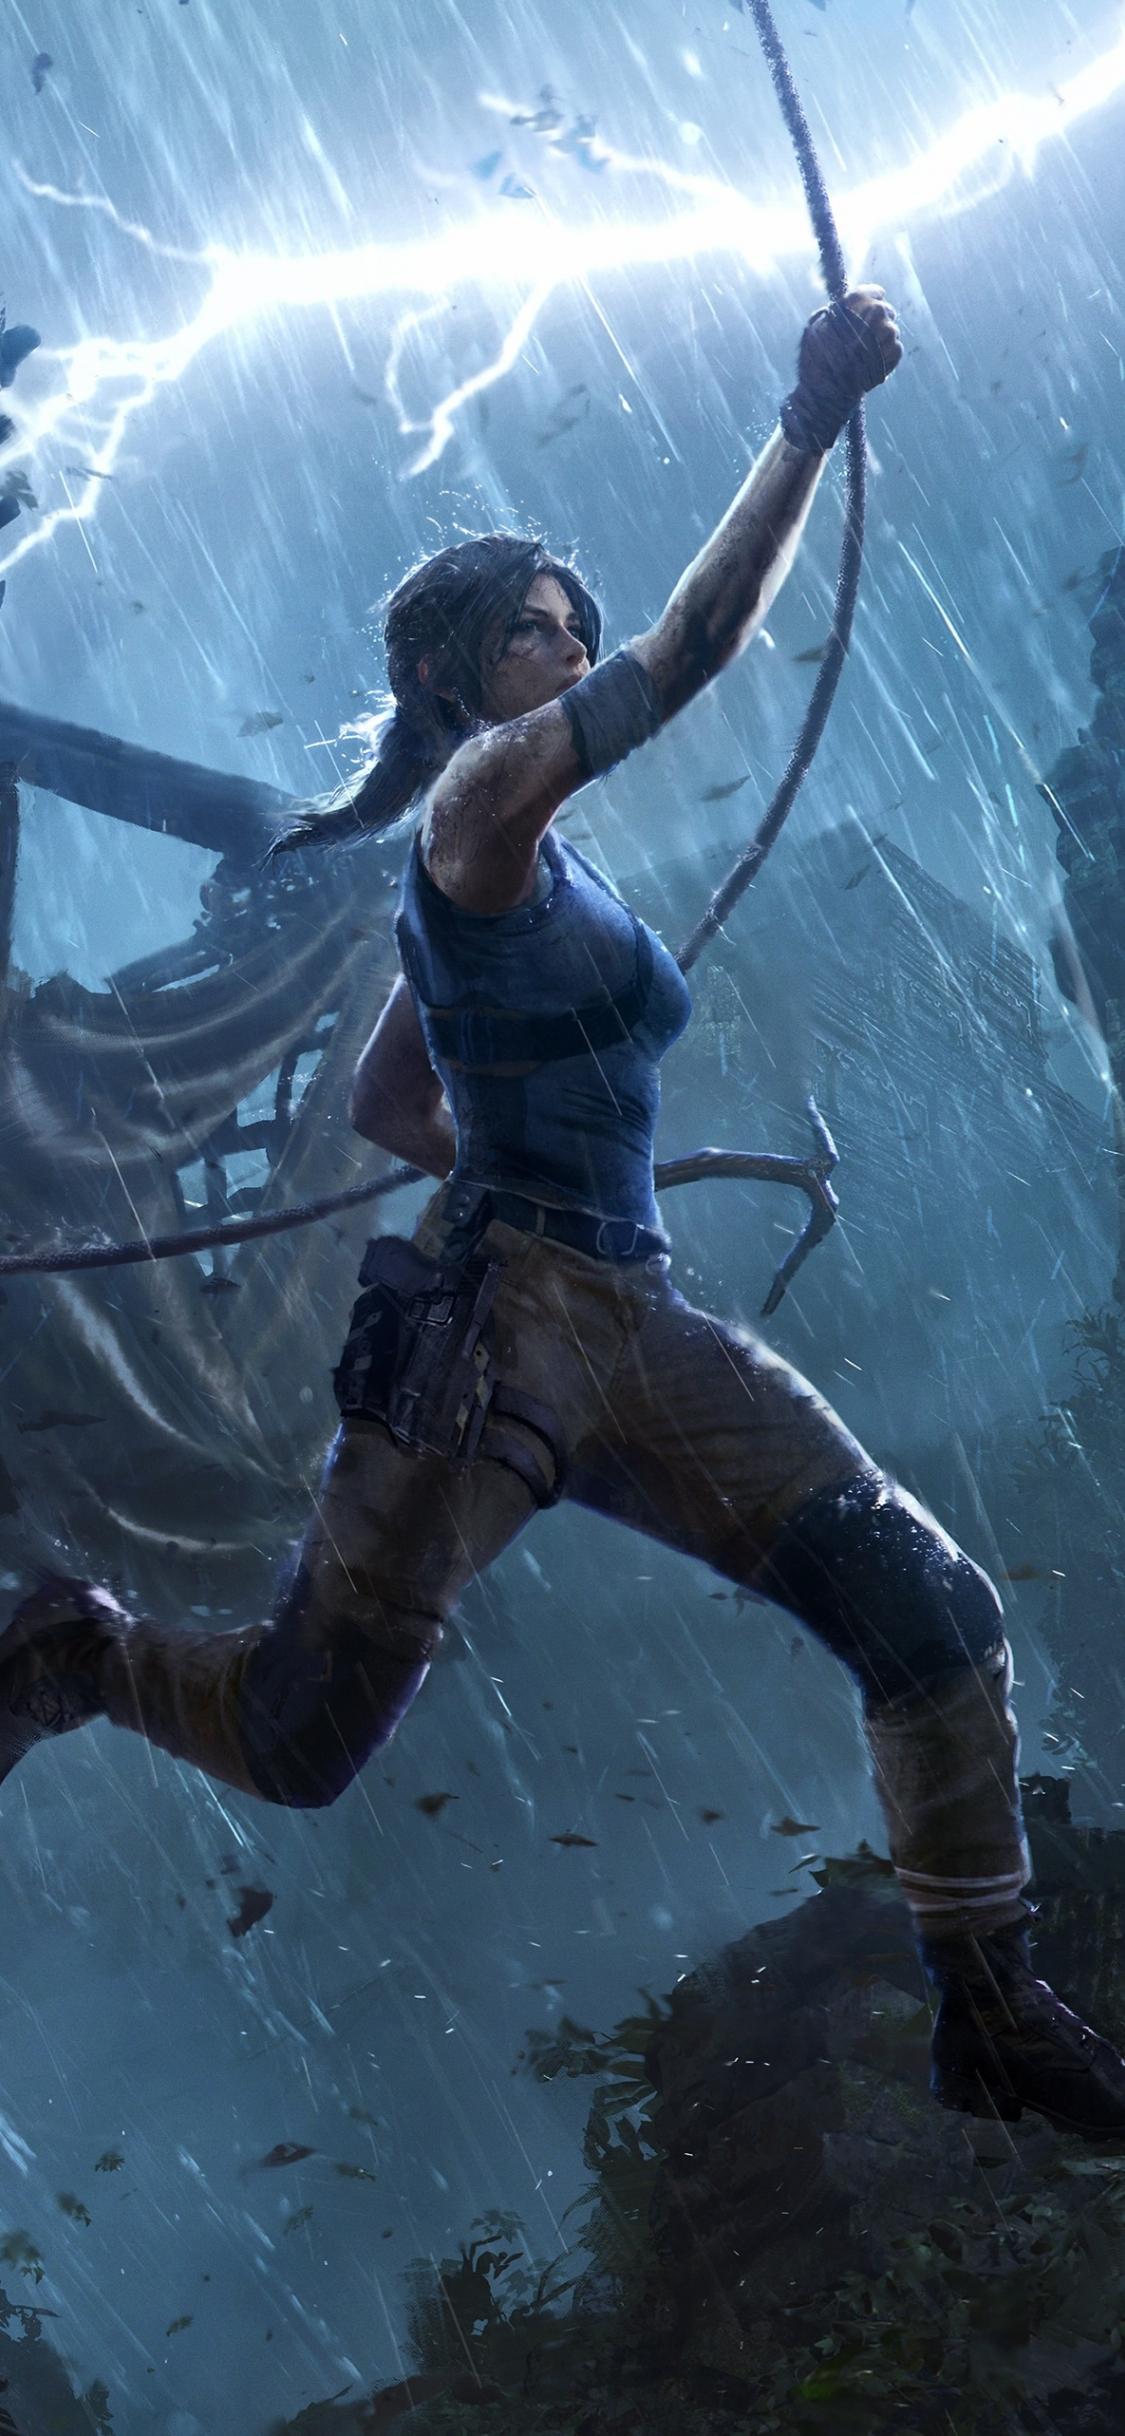 Download 1125x2436 Wallpaper Lara Croft Shadow Of The Tomb Raider